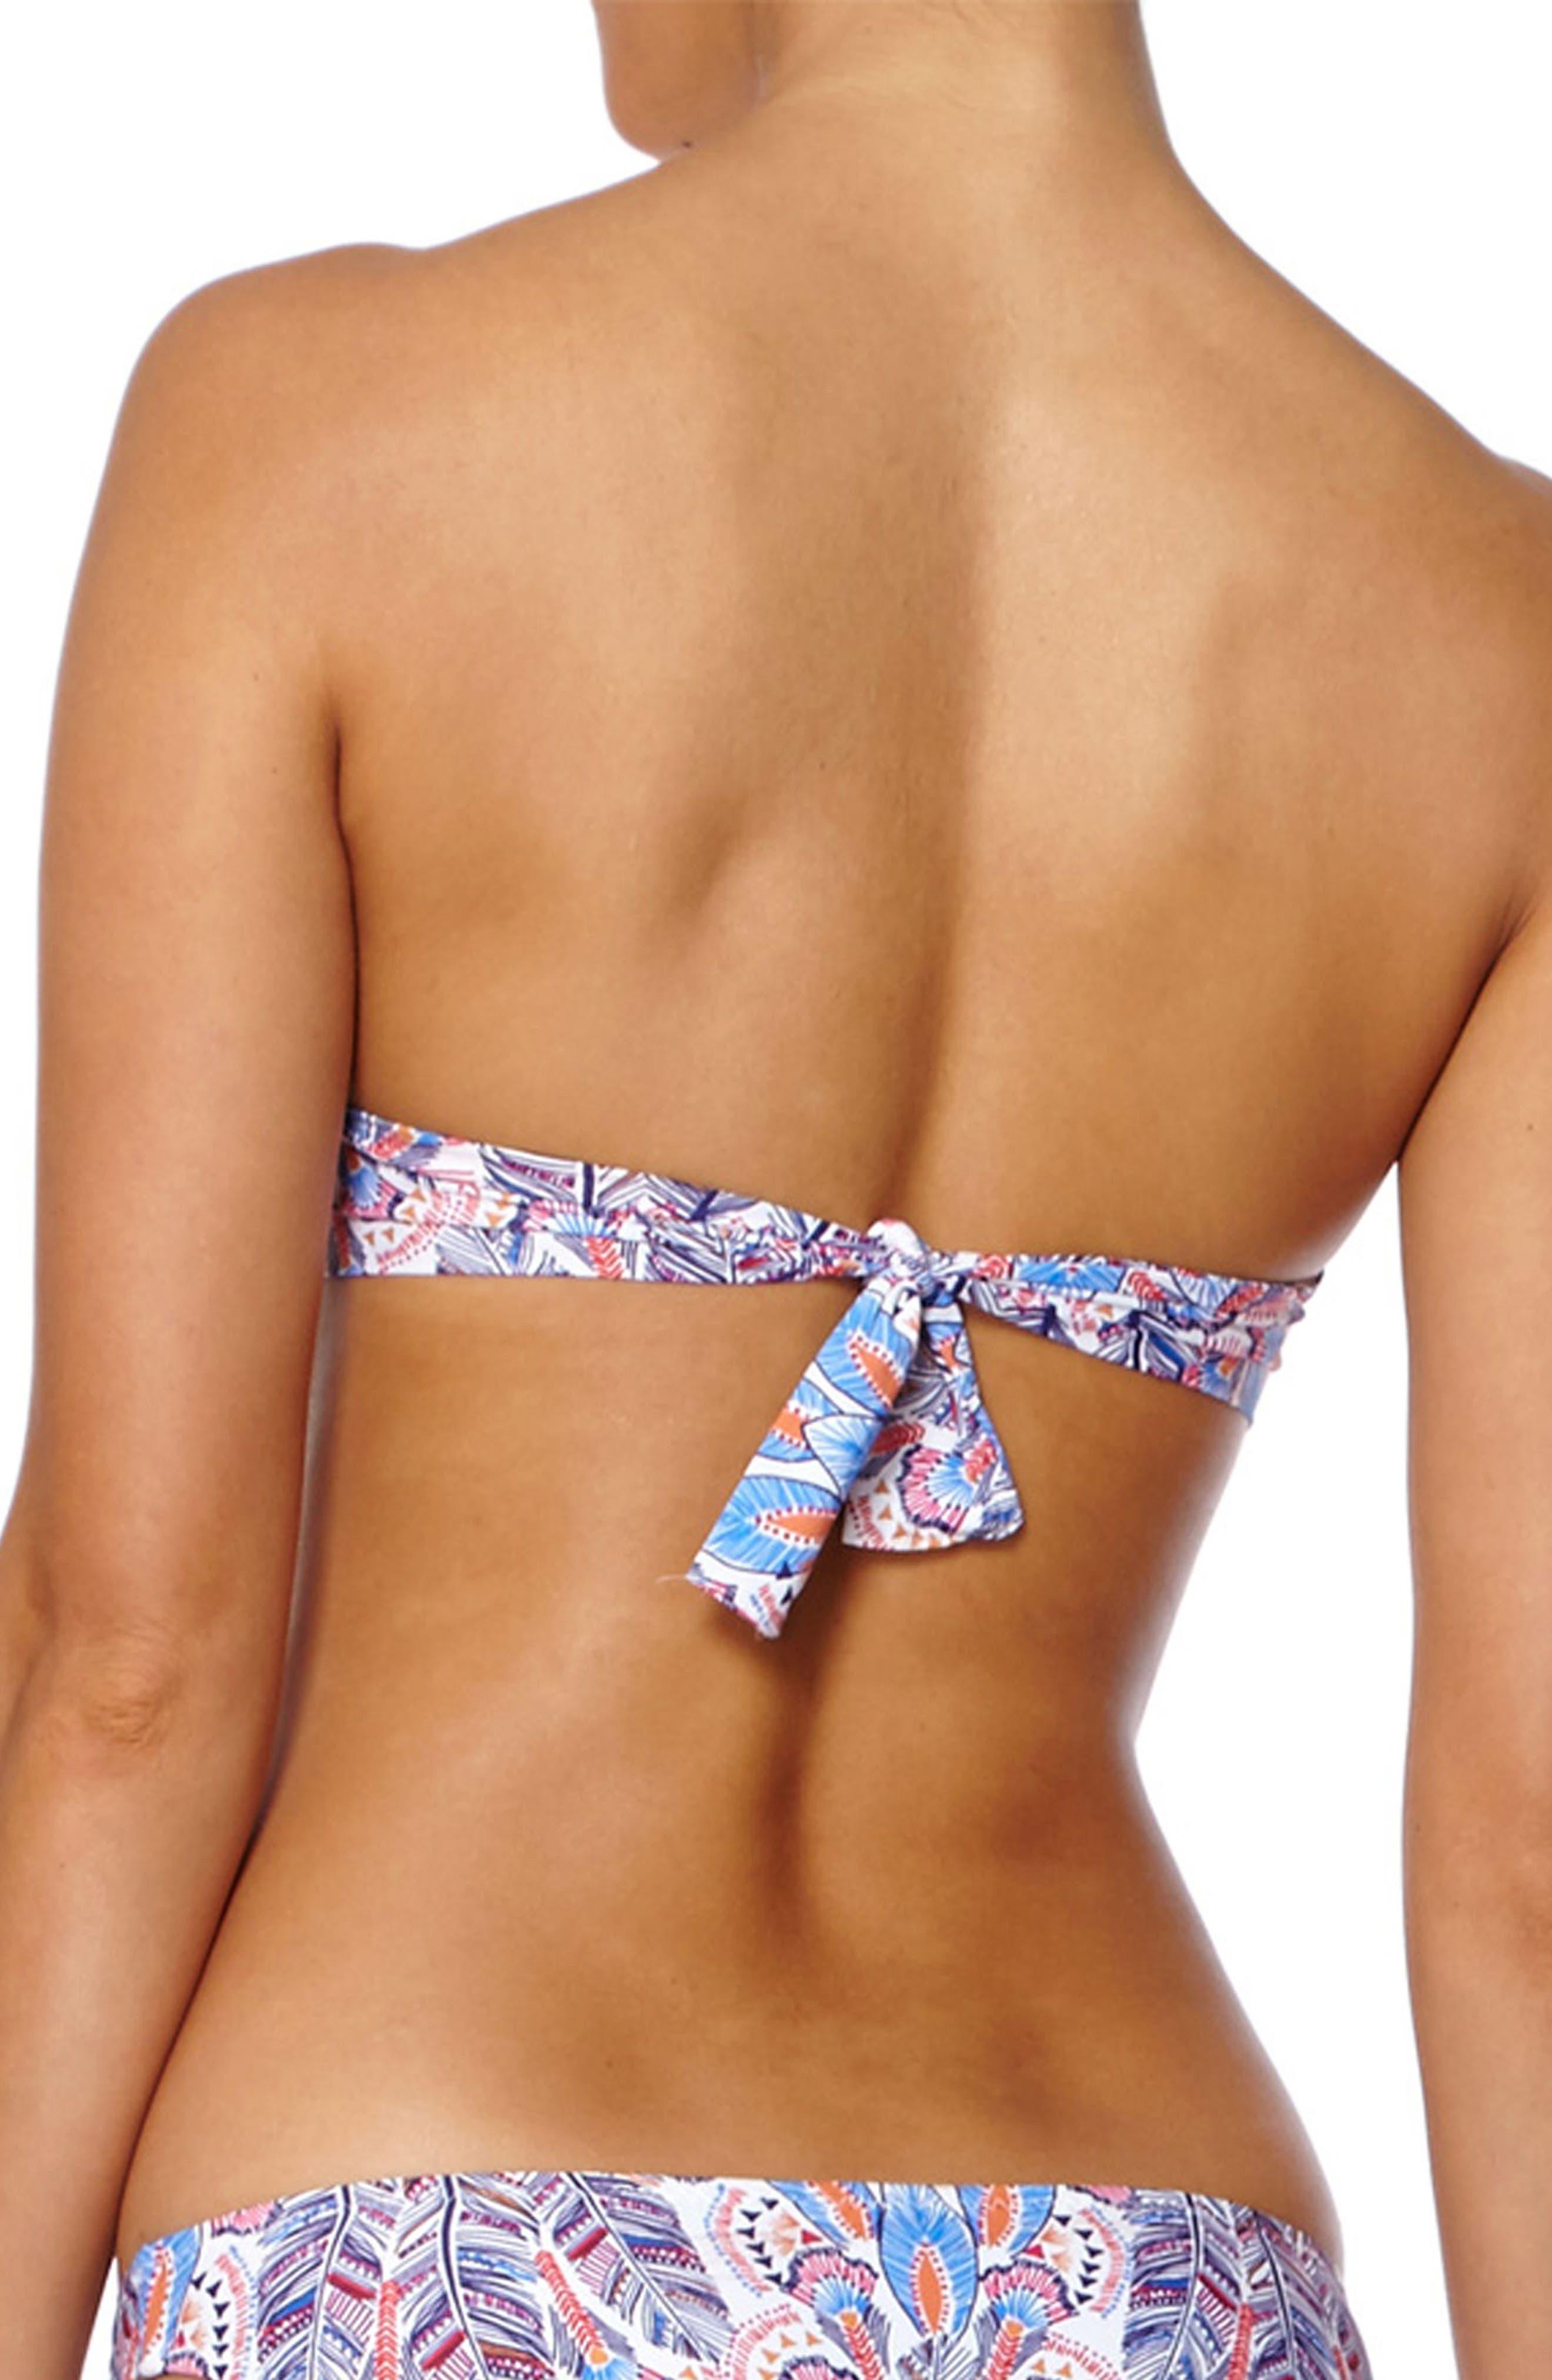 Martinique Bandeau Bikini Top,                             Alternate thumbnail 2, color,                             FEATHERS